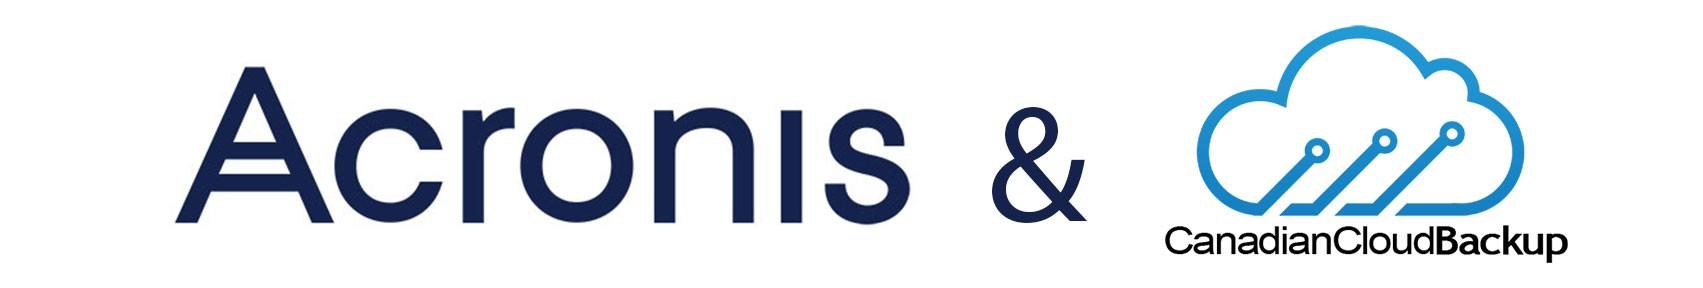 Acronis Backup Software | Canadian Cloud Backup